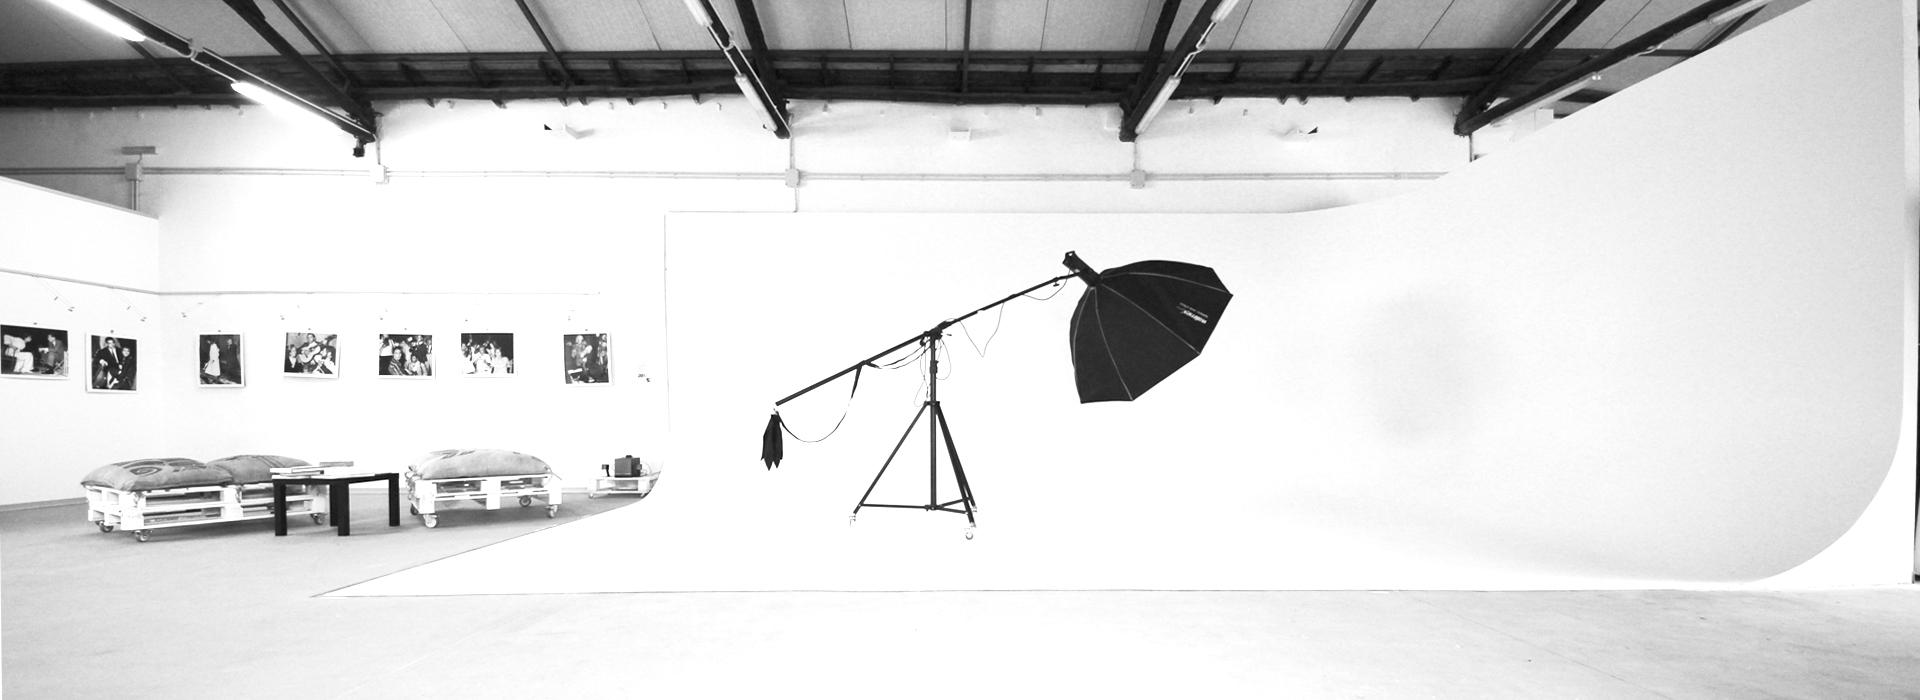 studio fotografico roma sala posa limbo cyclorama